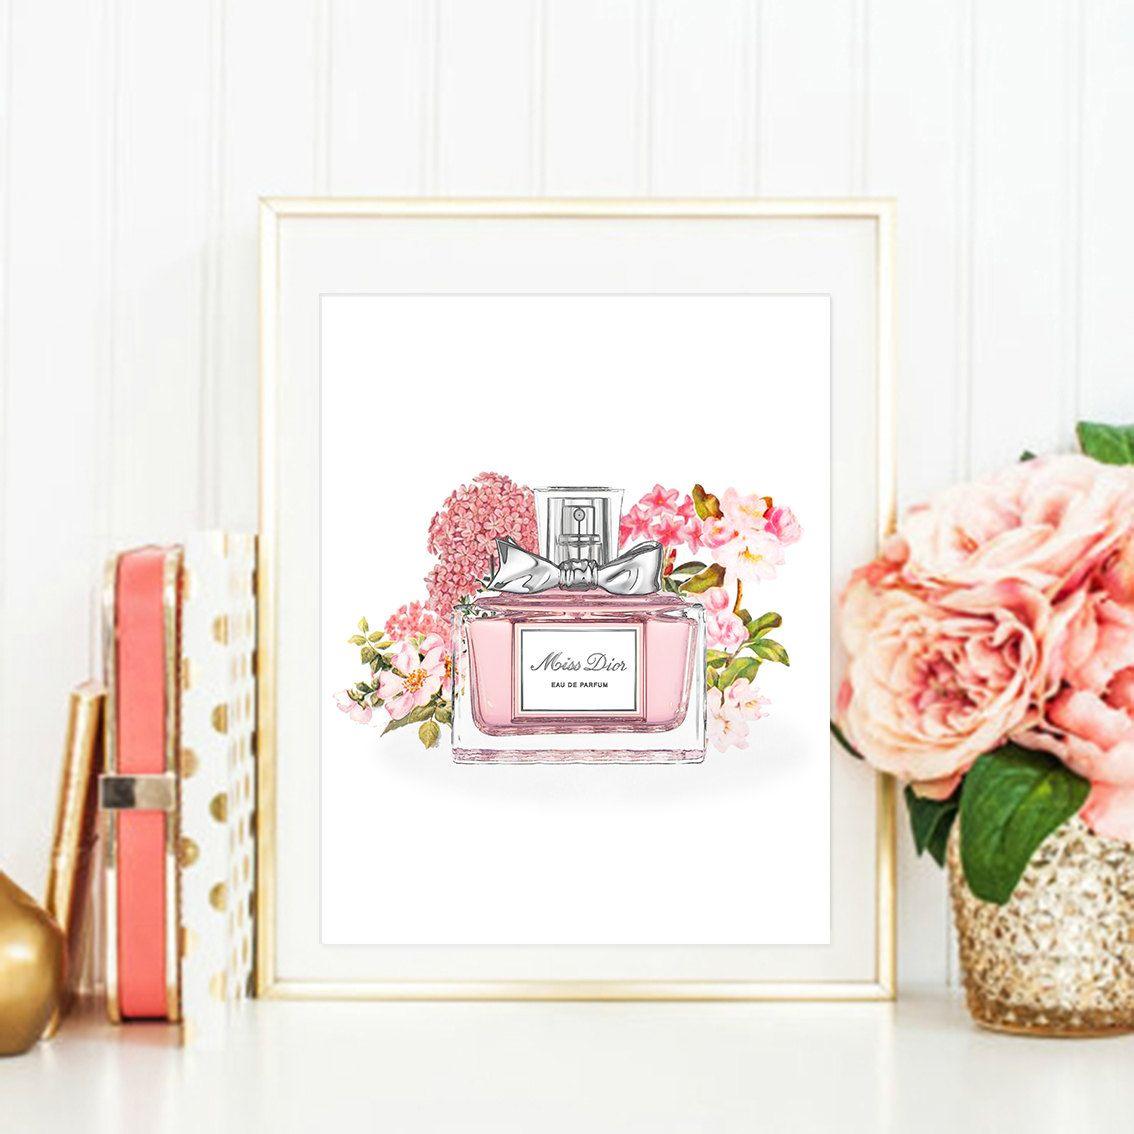 dior perfume wallpaper - photo #10